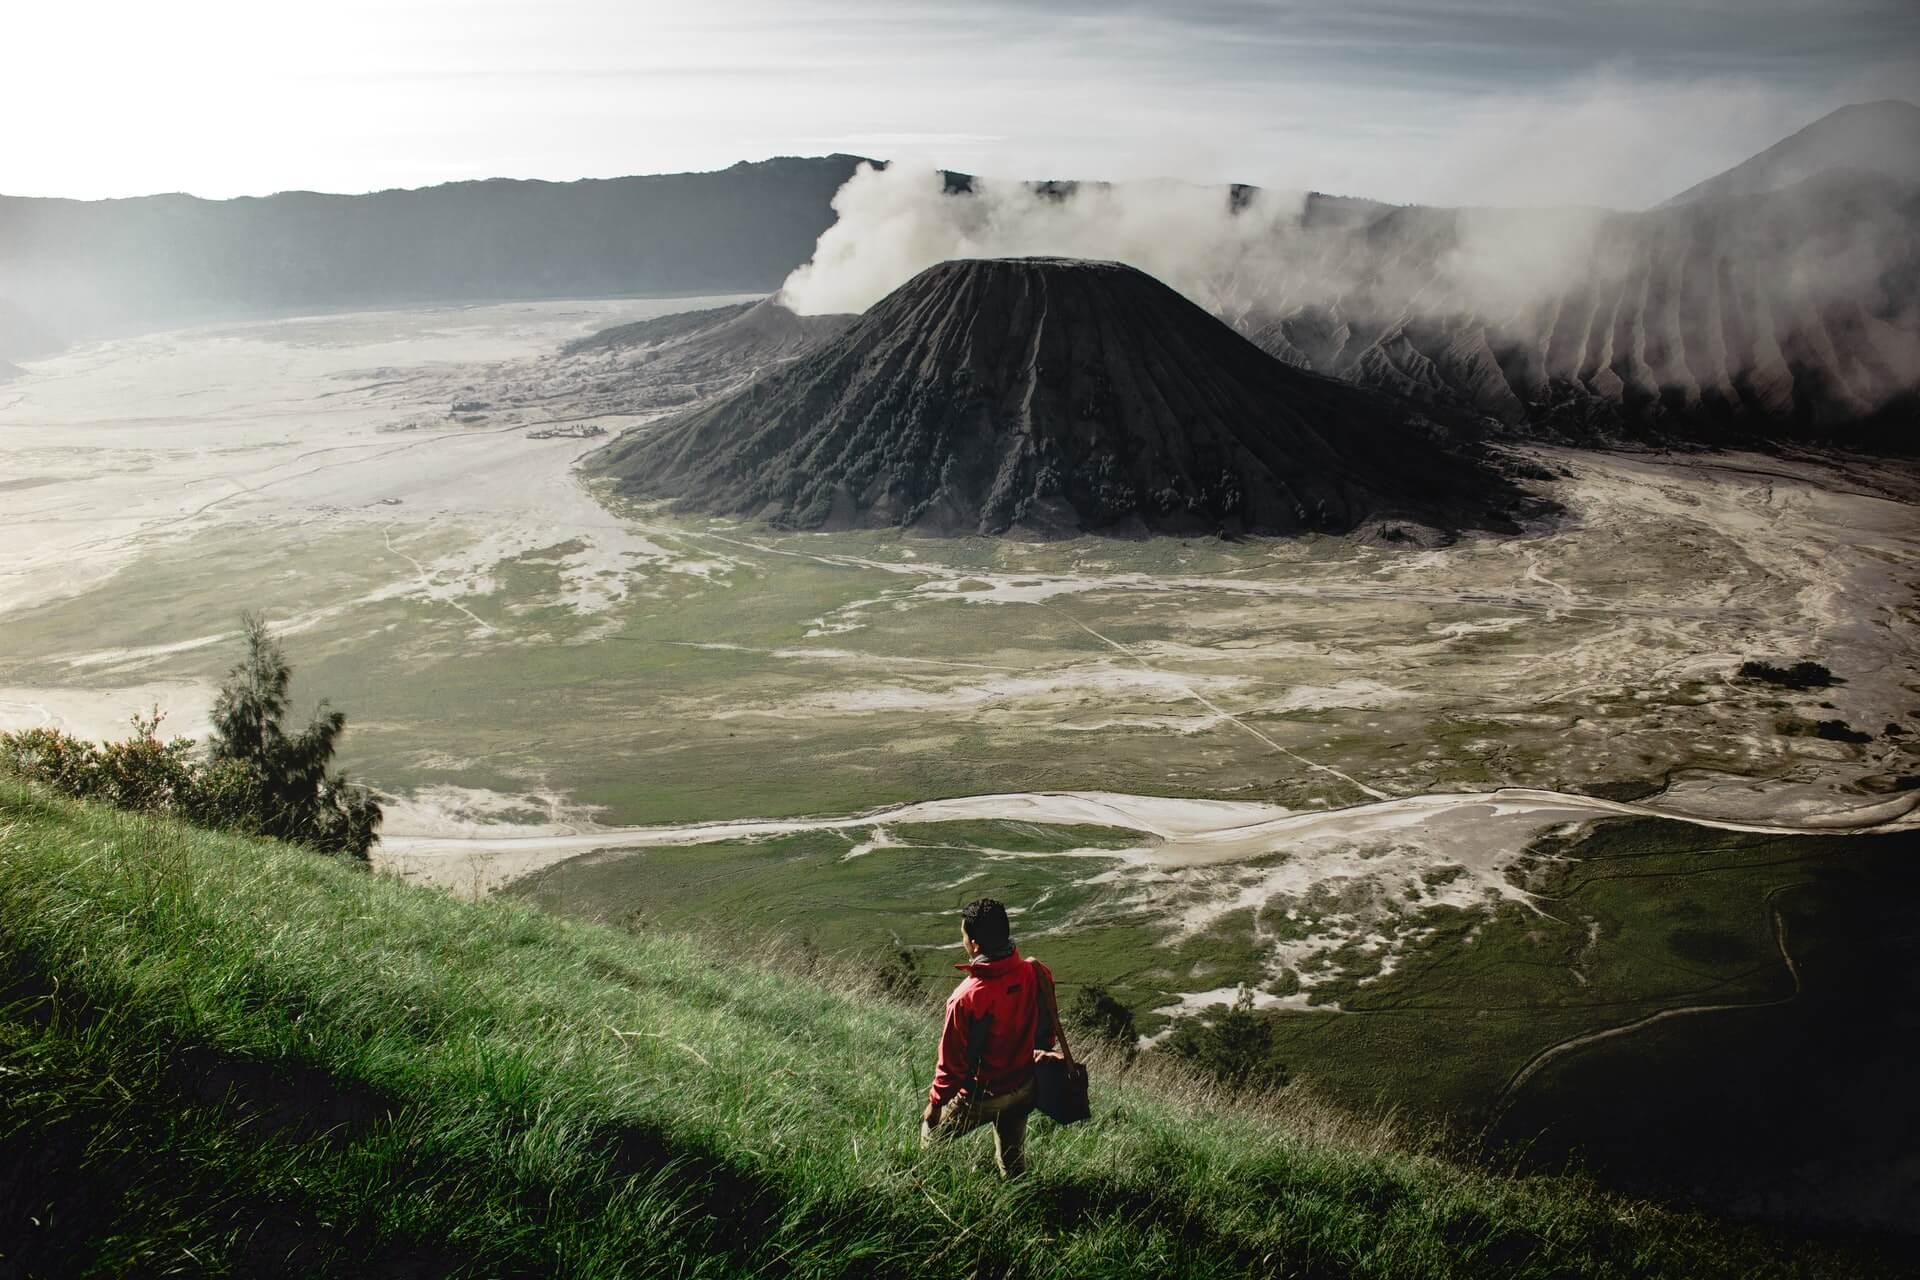 indonesia-brand-image.jpg